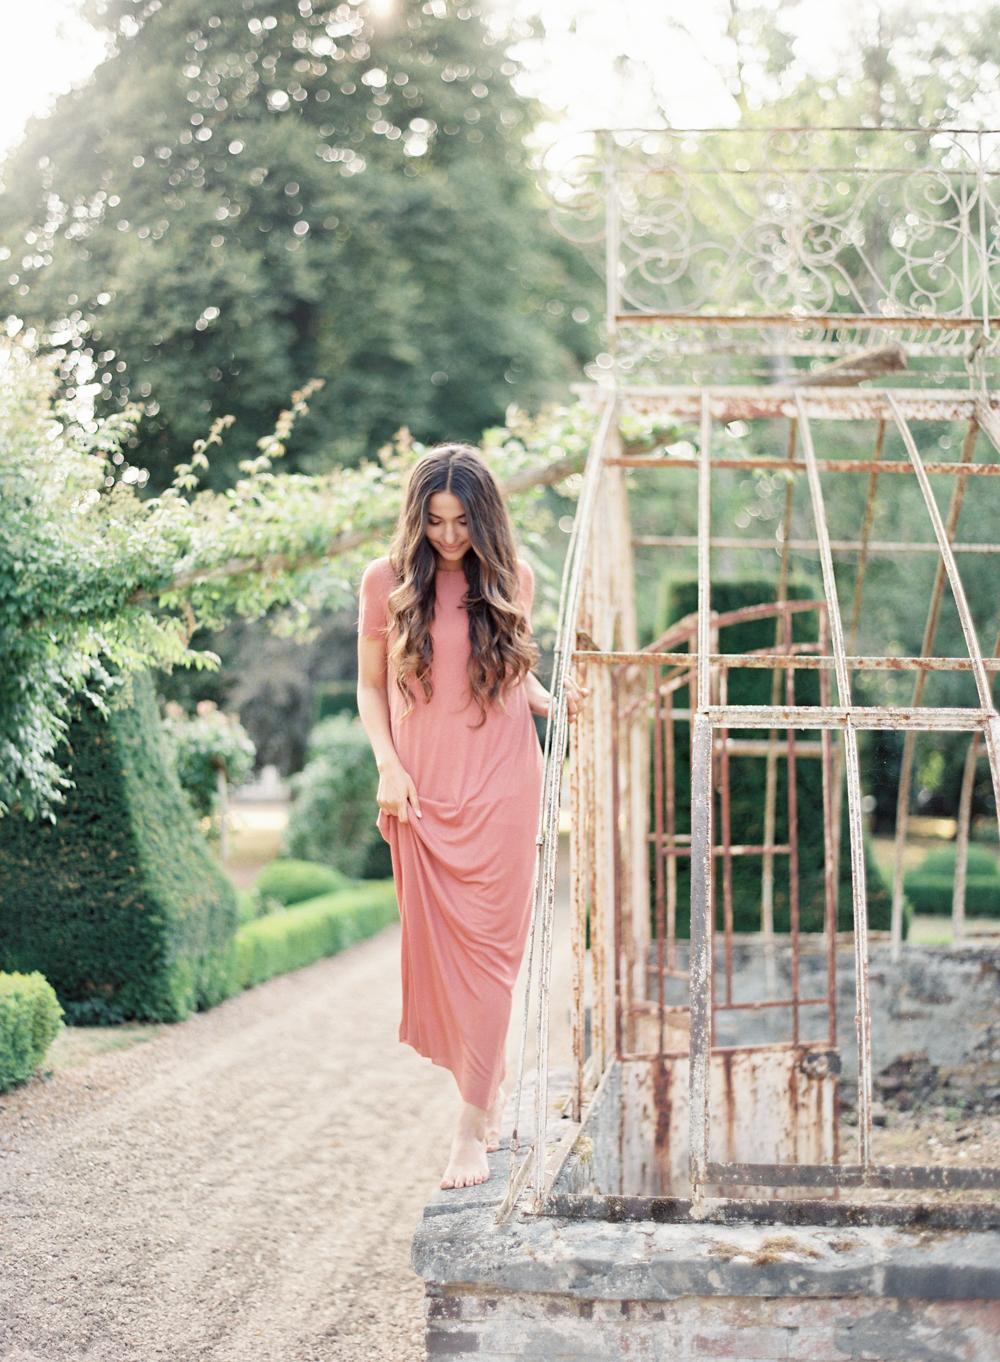 Vicki+Grafton+Photography+Paris+Film+Wedding+Photographer+-1-7.jpg